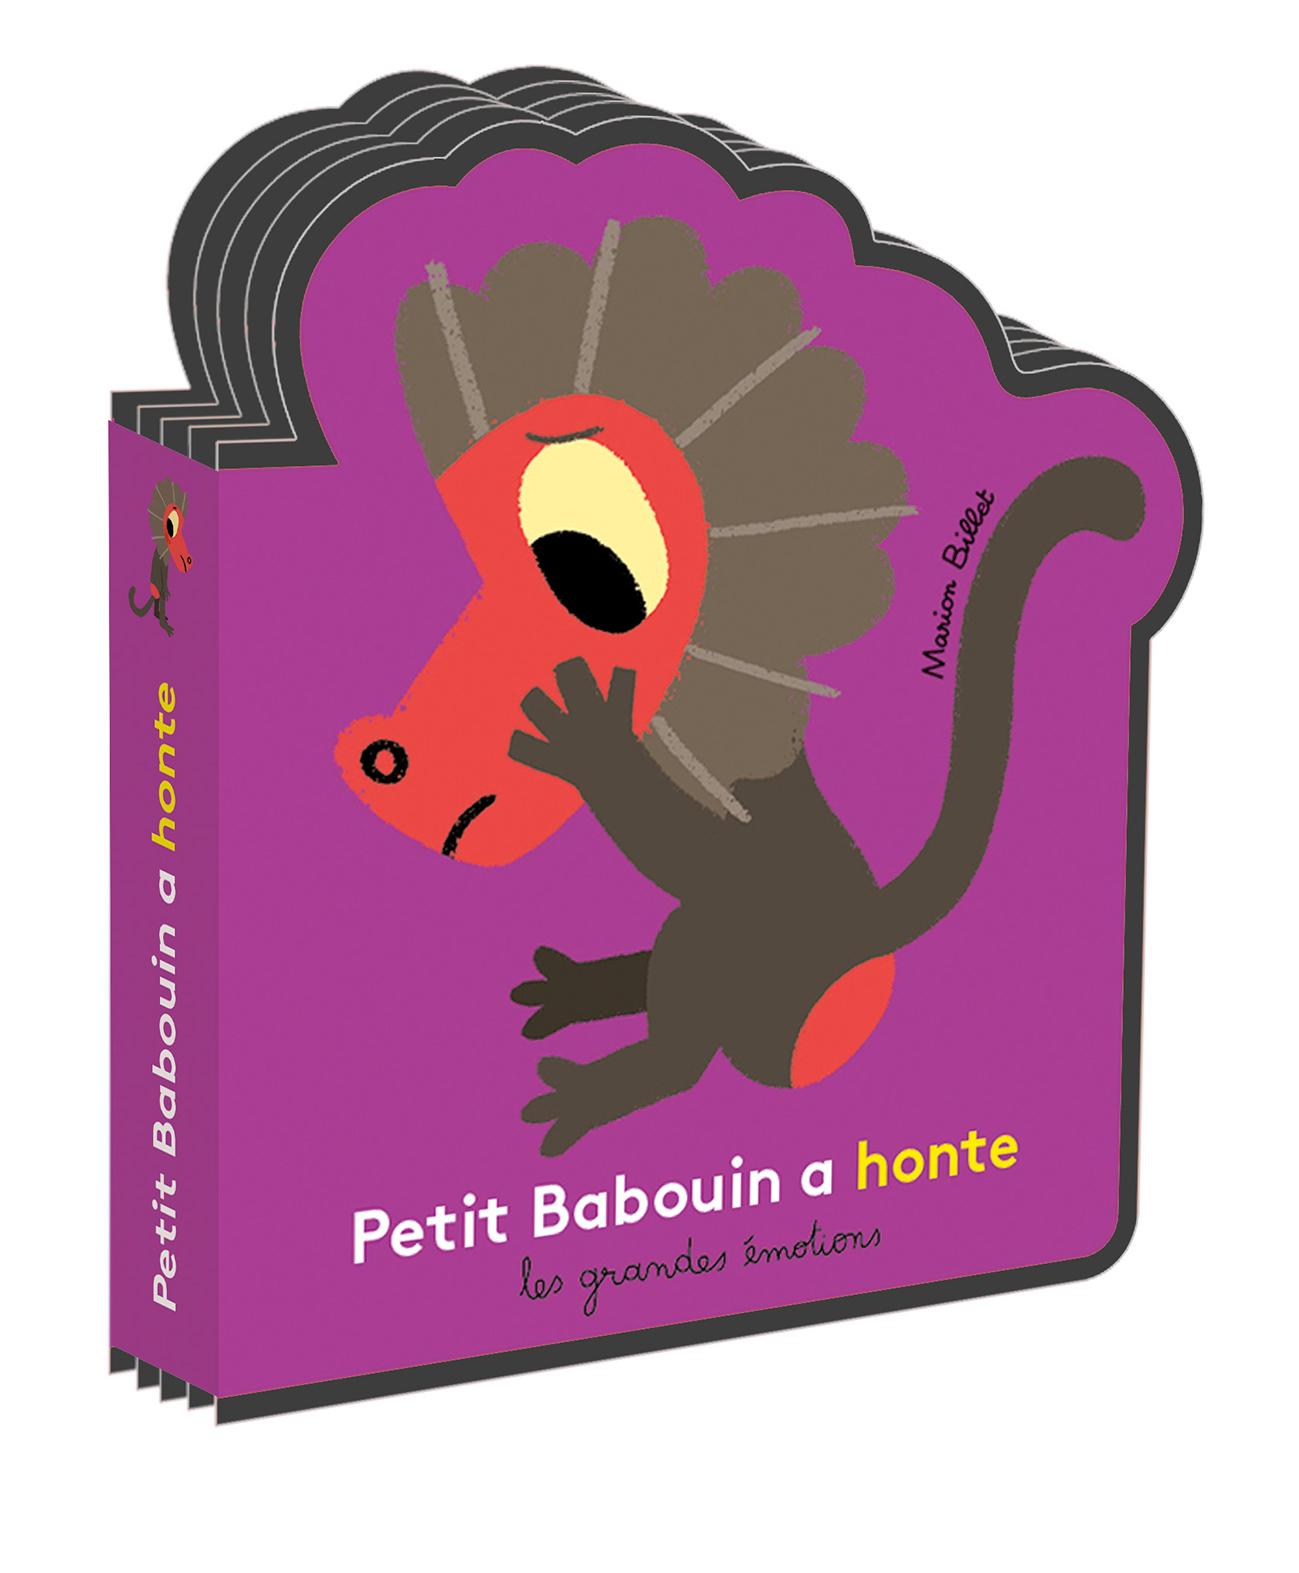 PETIT BABOUIN A HONTE